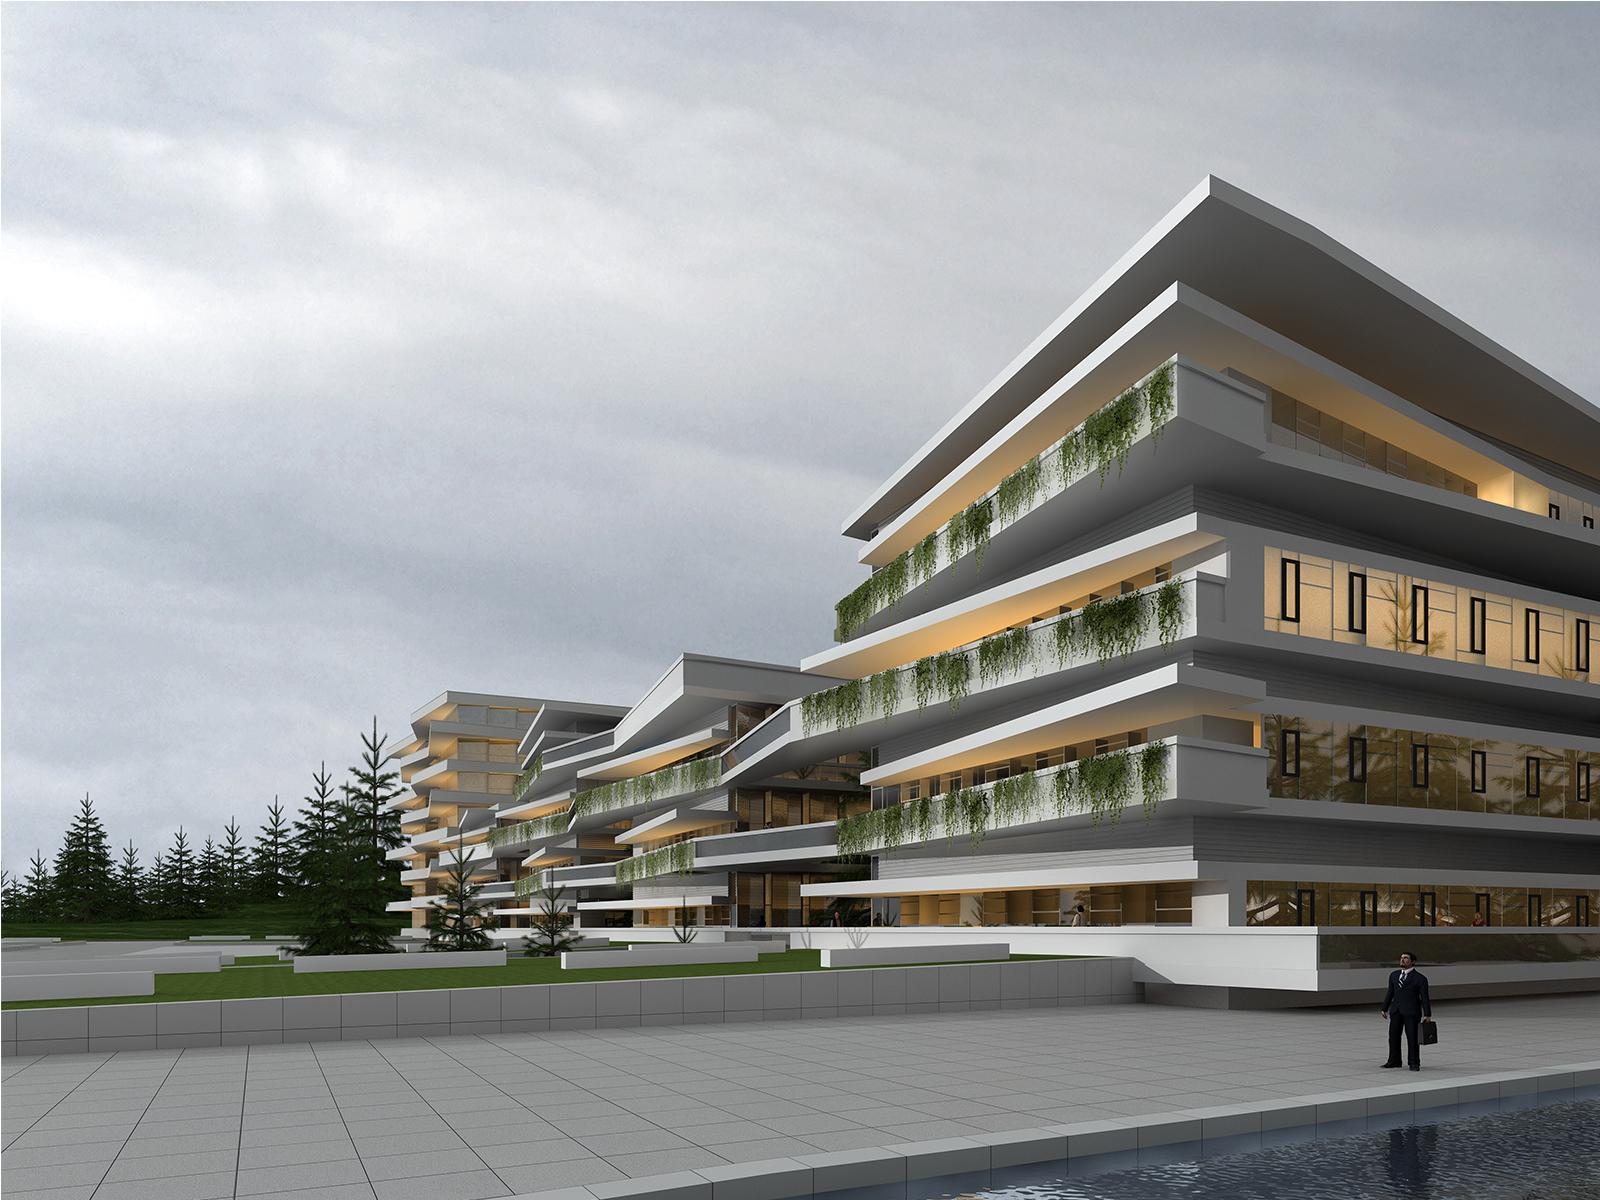 深圳大学附属医院_Shenzhen University Hospital_Right_03.jpg